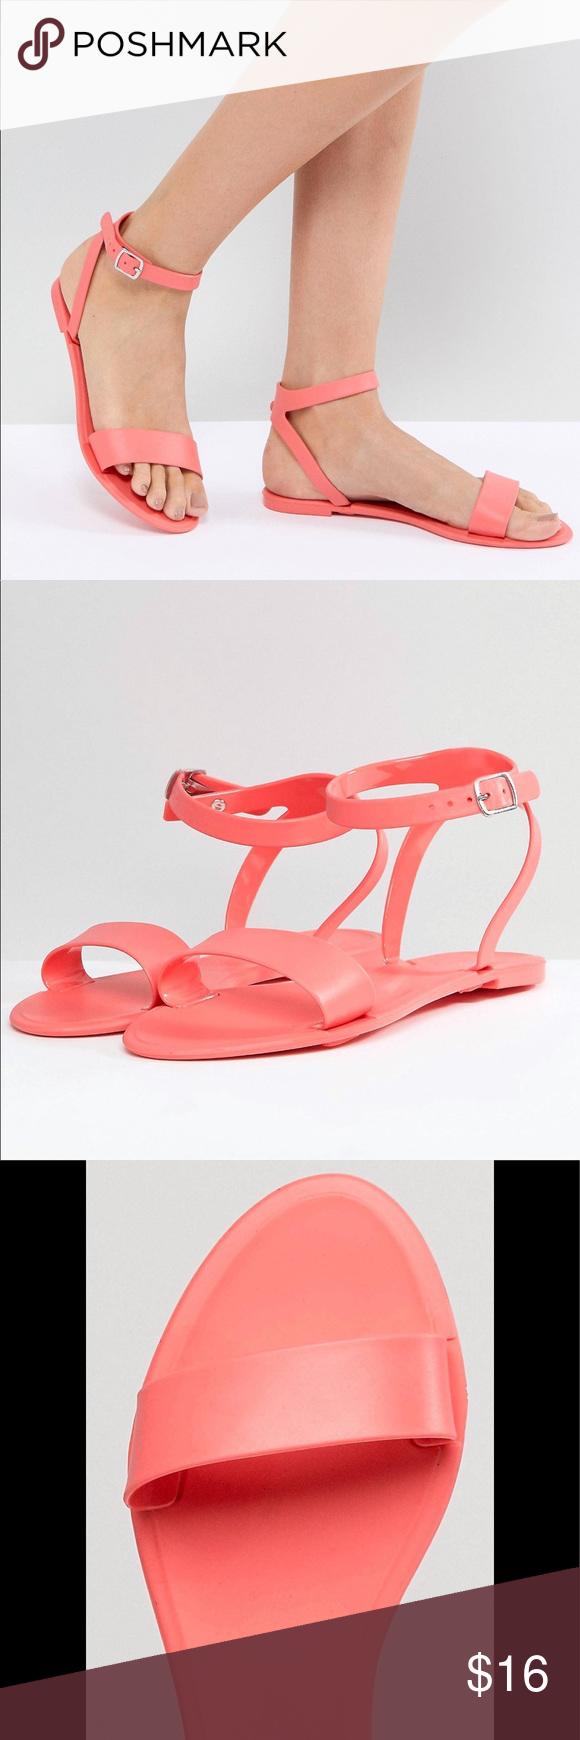 f6d0a4d410e5 Asos Felina Jelly Flat Sandals Jelly-style upper Ankle-strap fastening Open  toe Flat